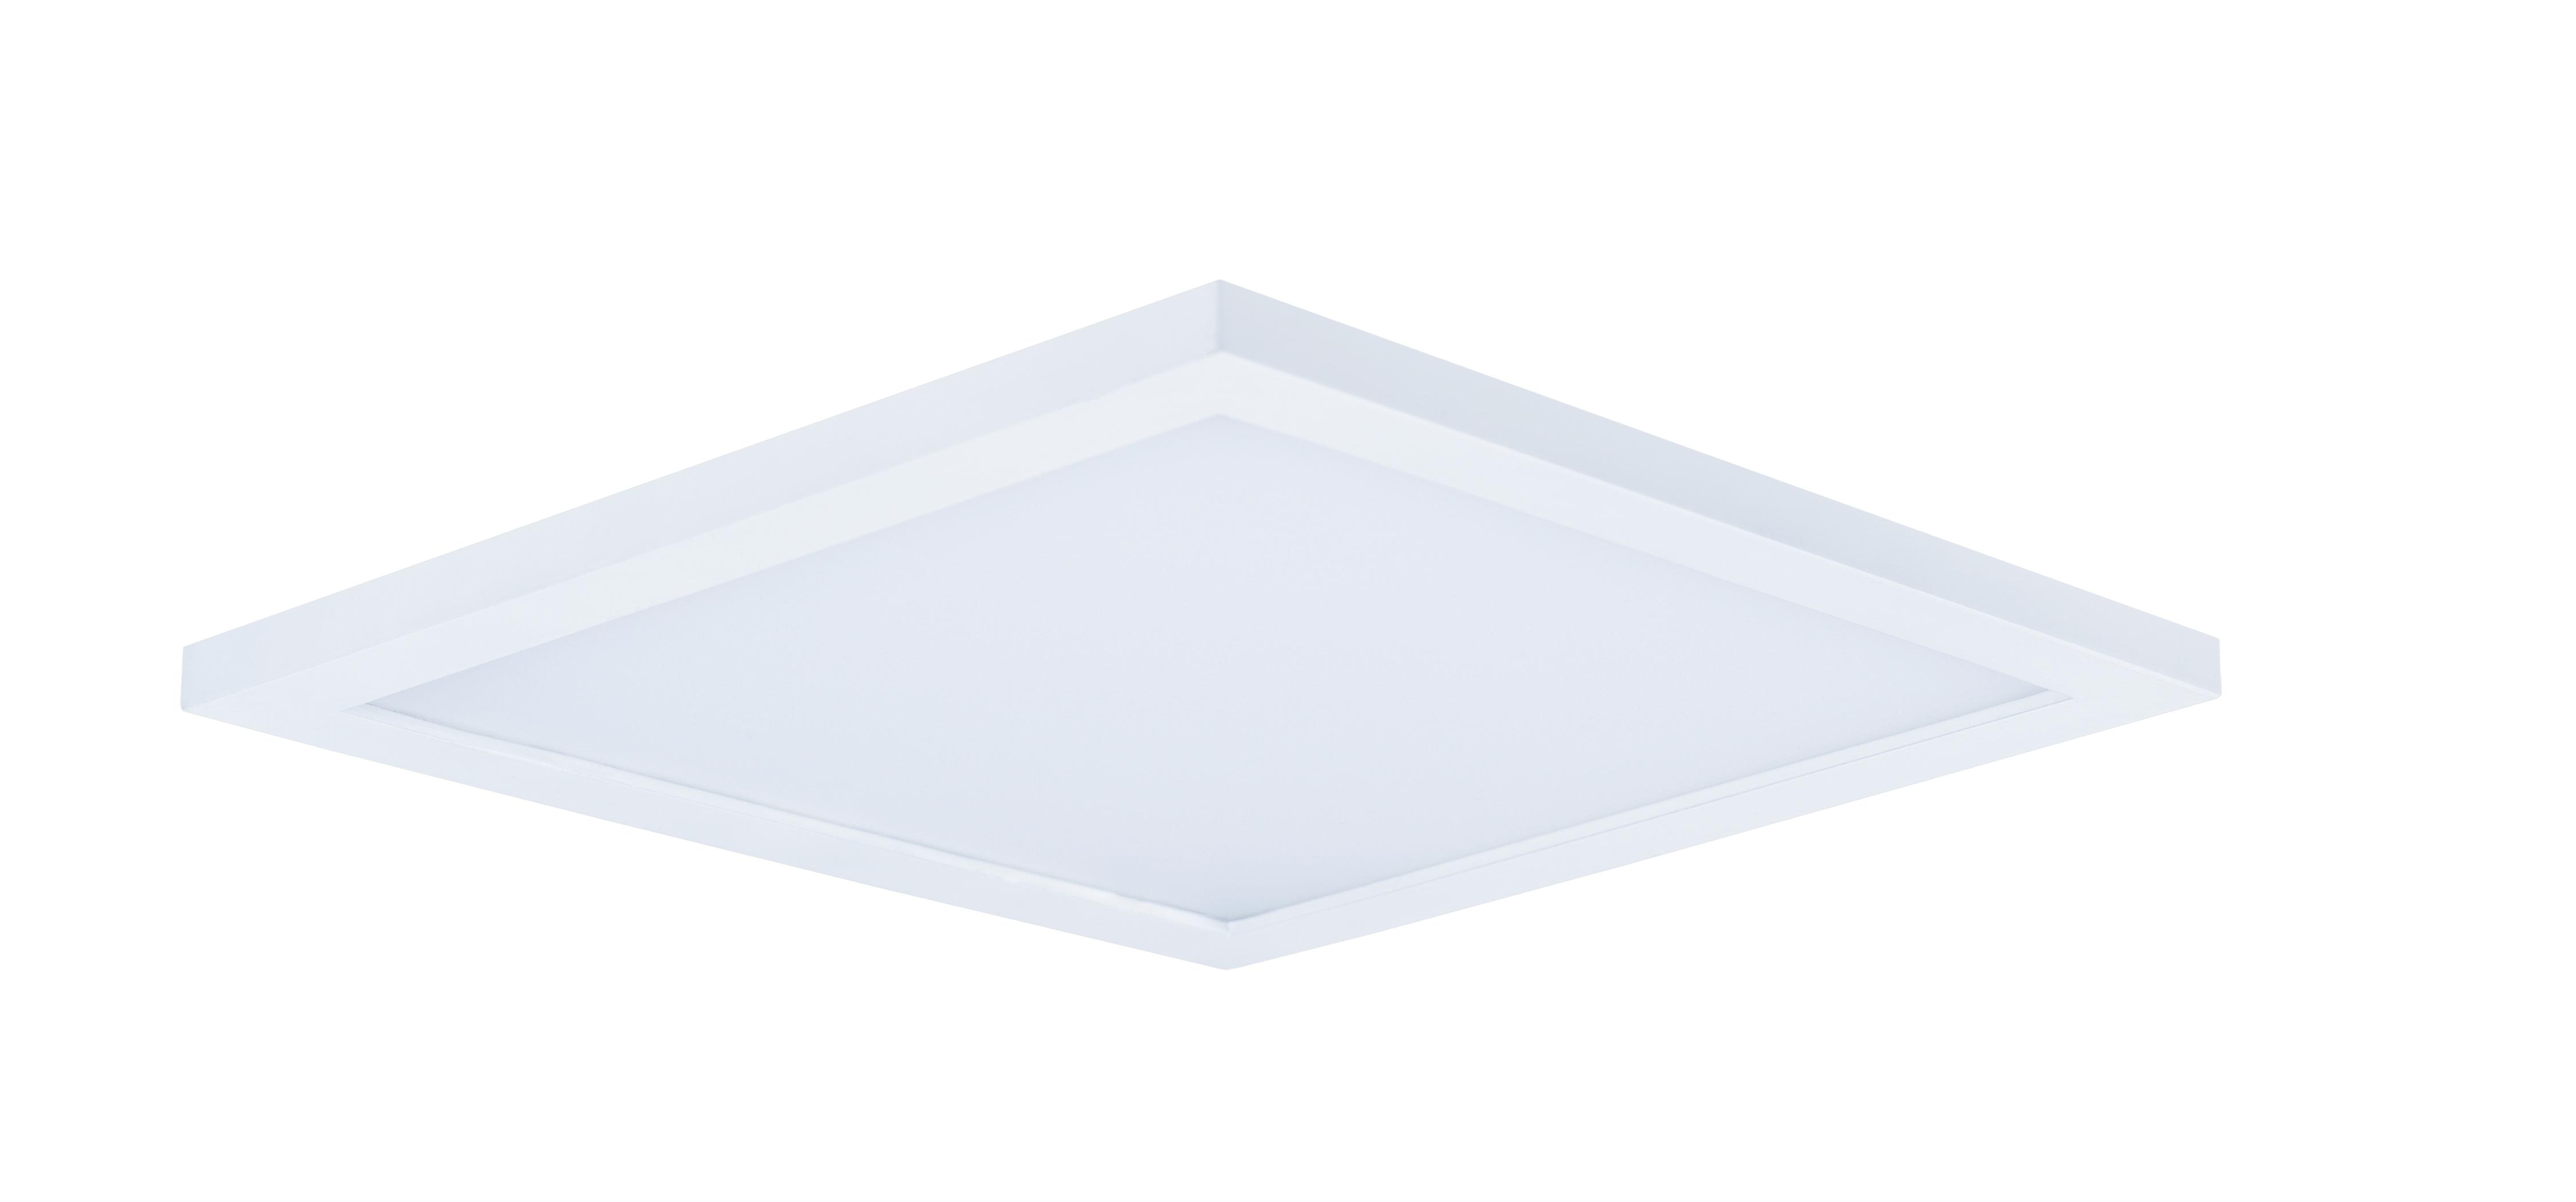 Wafer 15-inch Square 4000K Flush Mount | Maxim Lighting